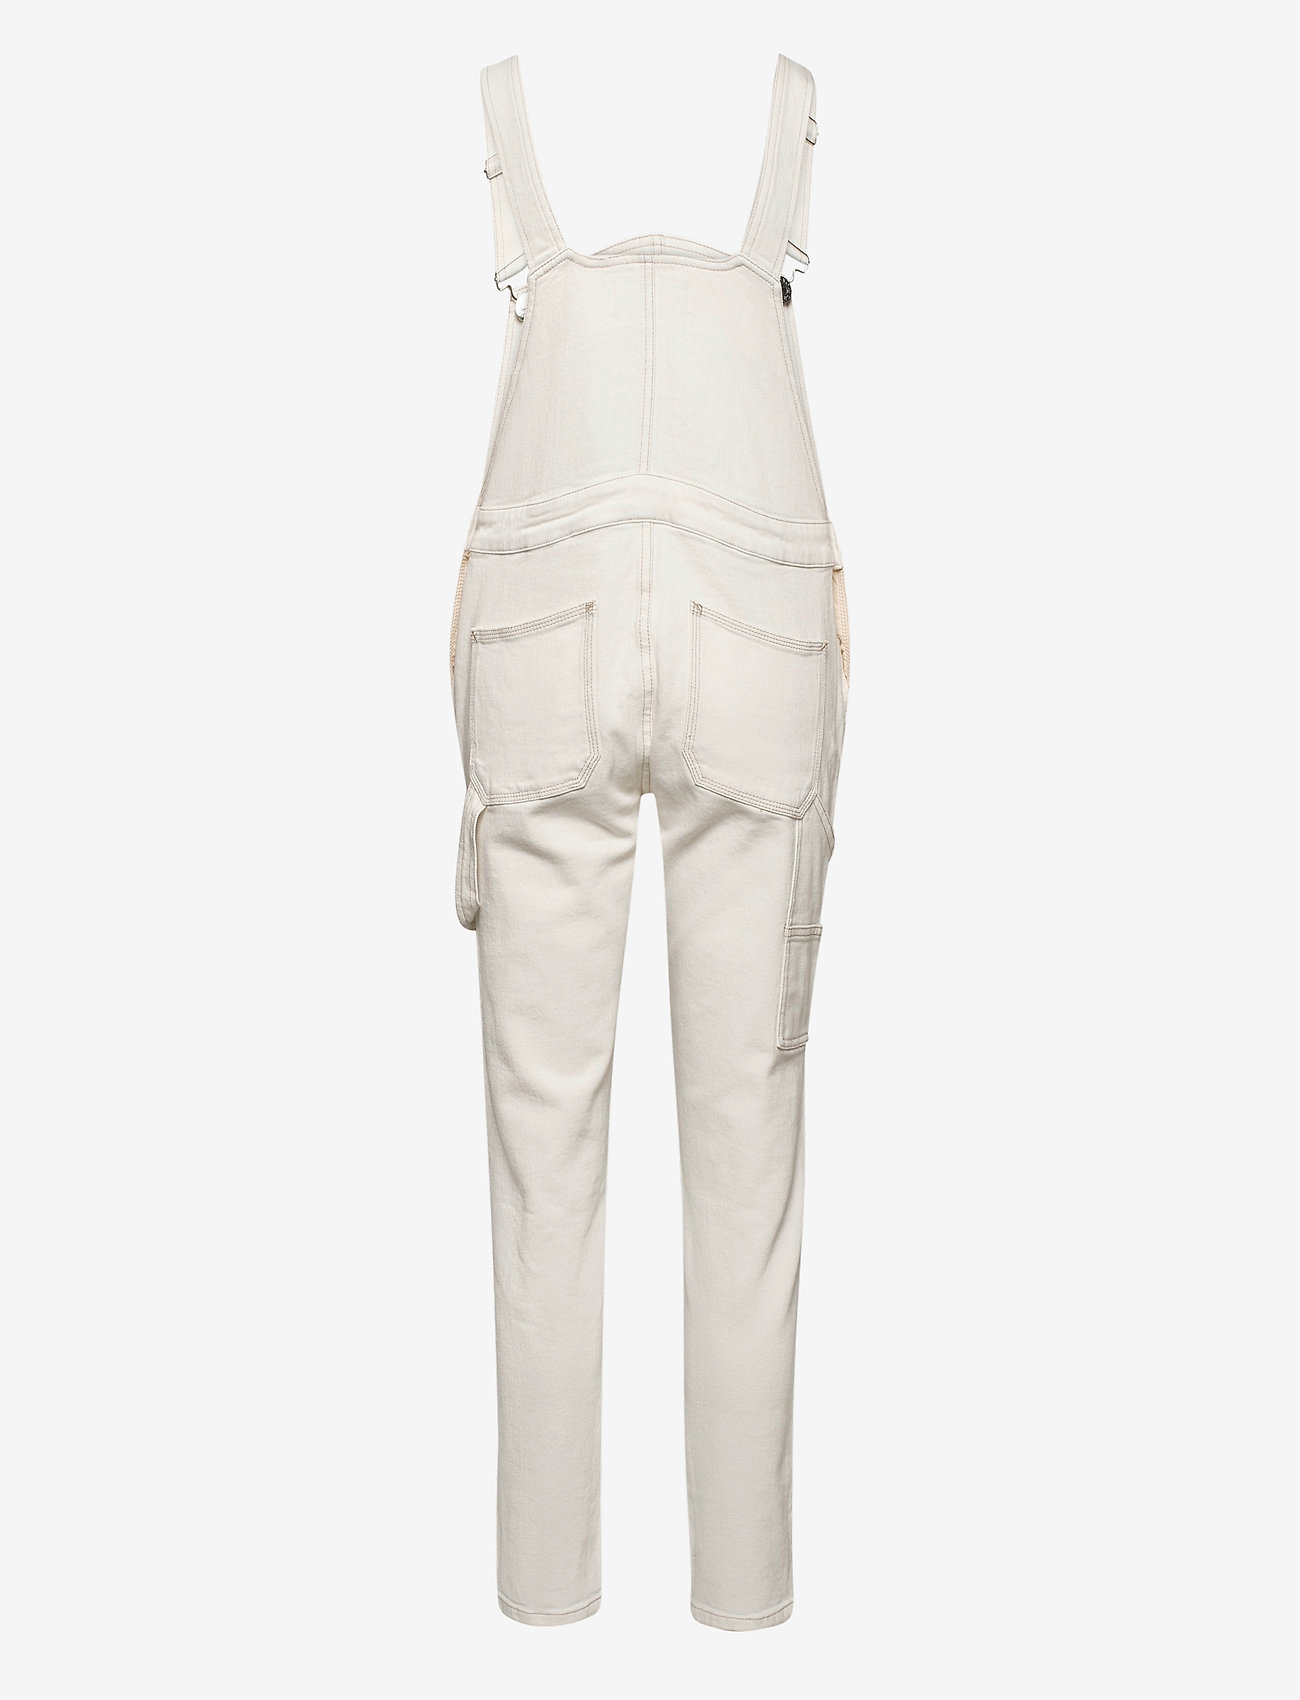 Tomorrow - Lincoln overall ecru - clothing - ecru - 1